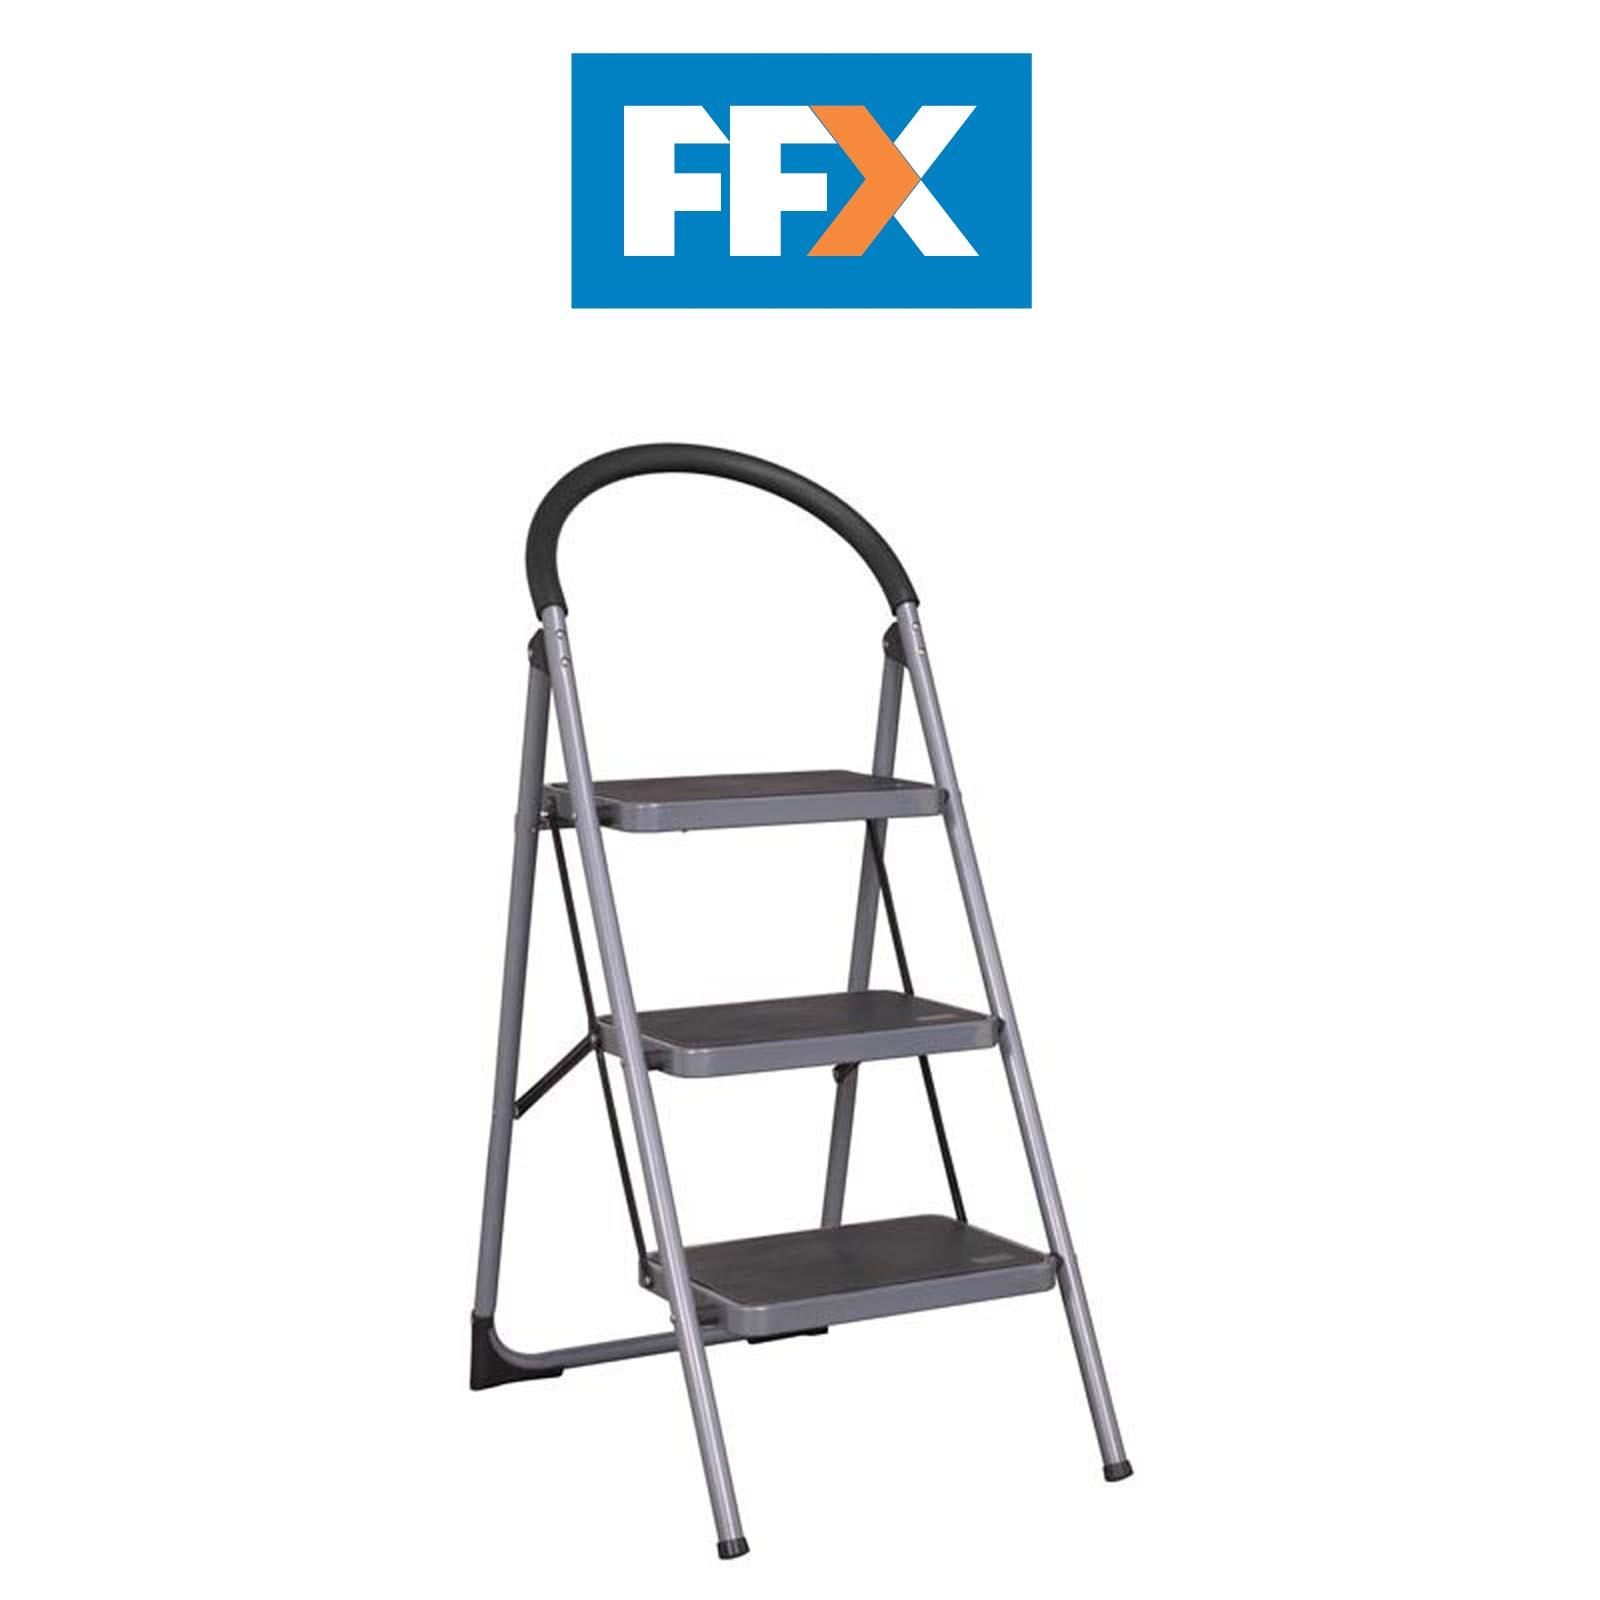 Image is loading Sealey-ASL23-Step-Stool-3-Tread-150kg-Capacity  sc 1 st  eBay & Sealey ASL23 Step Stool 3-Tread 150kg Capacity | eBay islam-shia.org